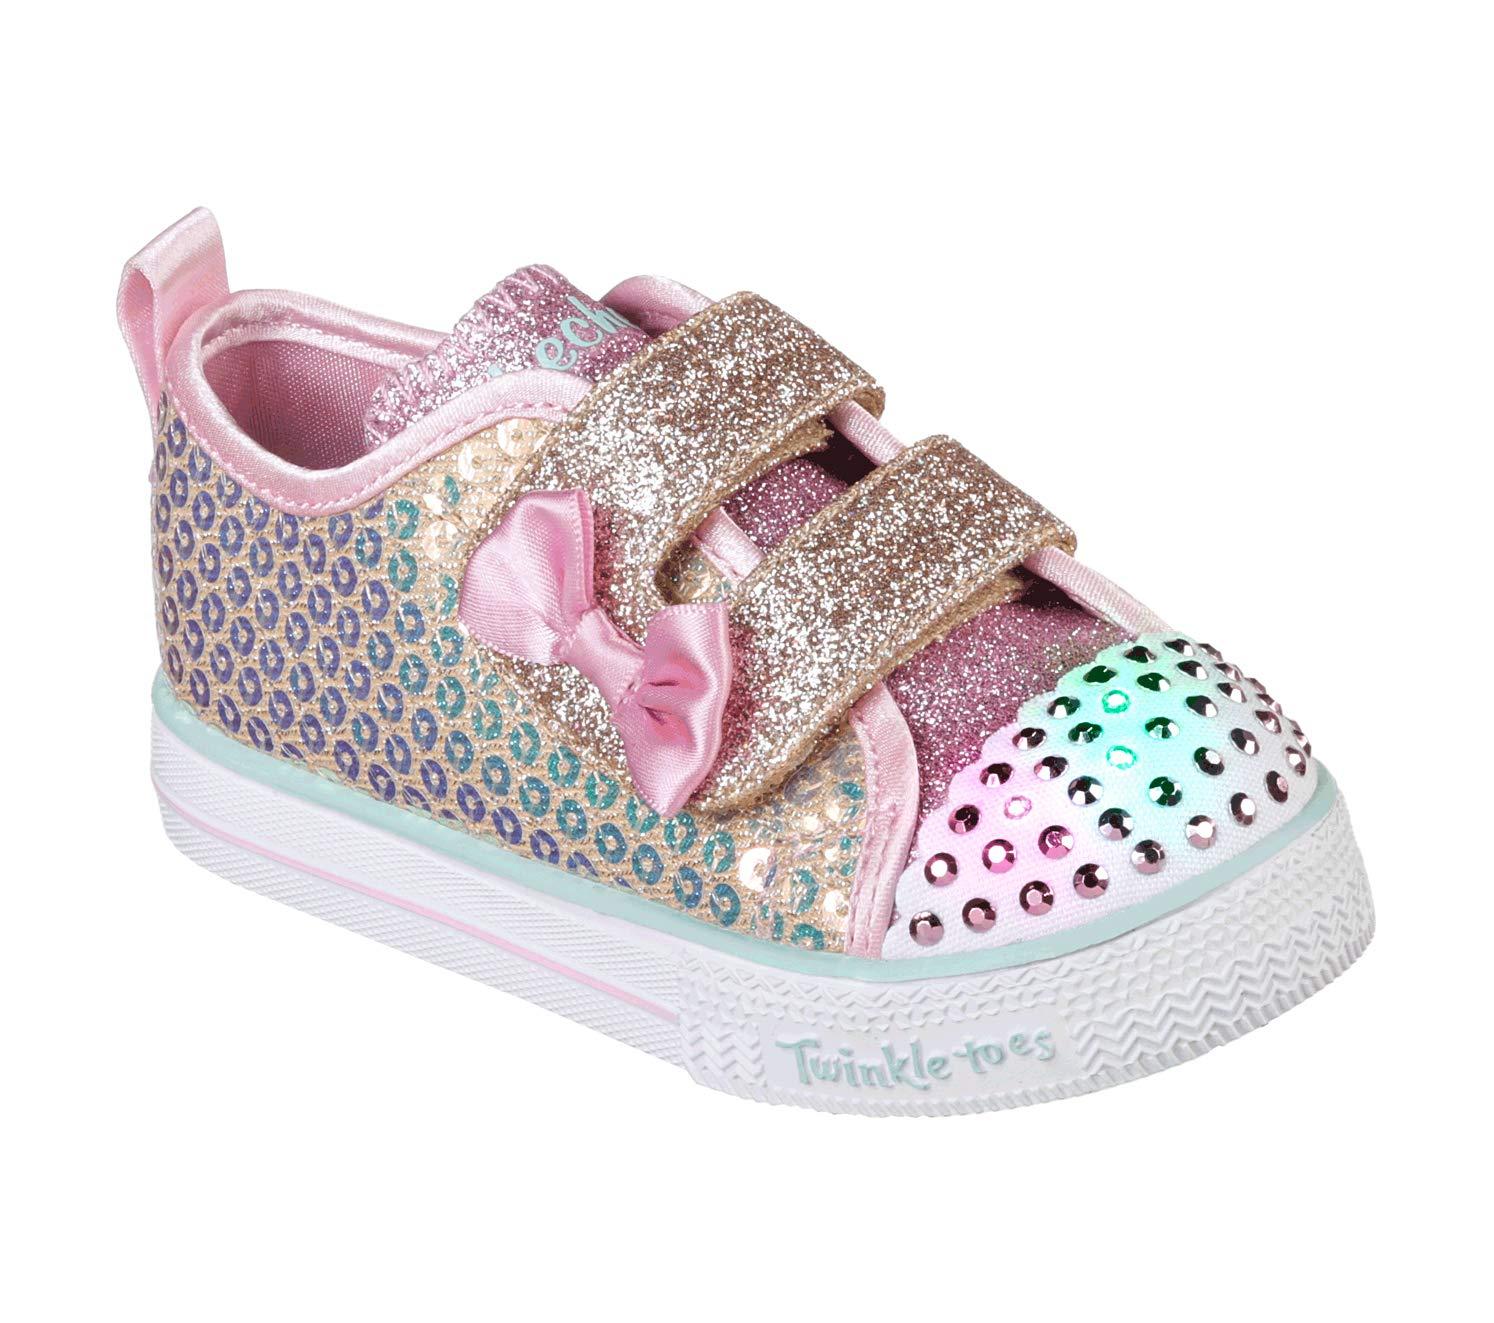 Skechers Kids Girls' Shuffle LITE-Mini Mermaid Sneaker, Gold, 10 Medium US Toddler by Skechers